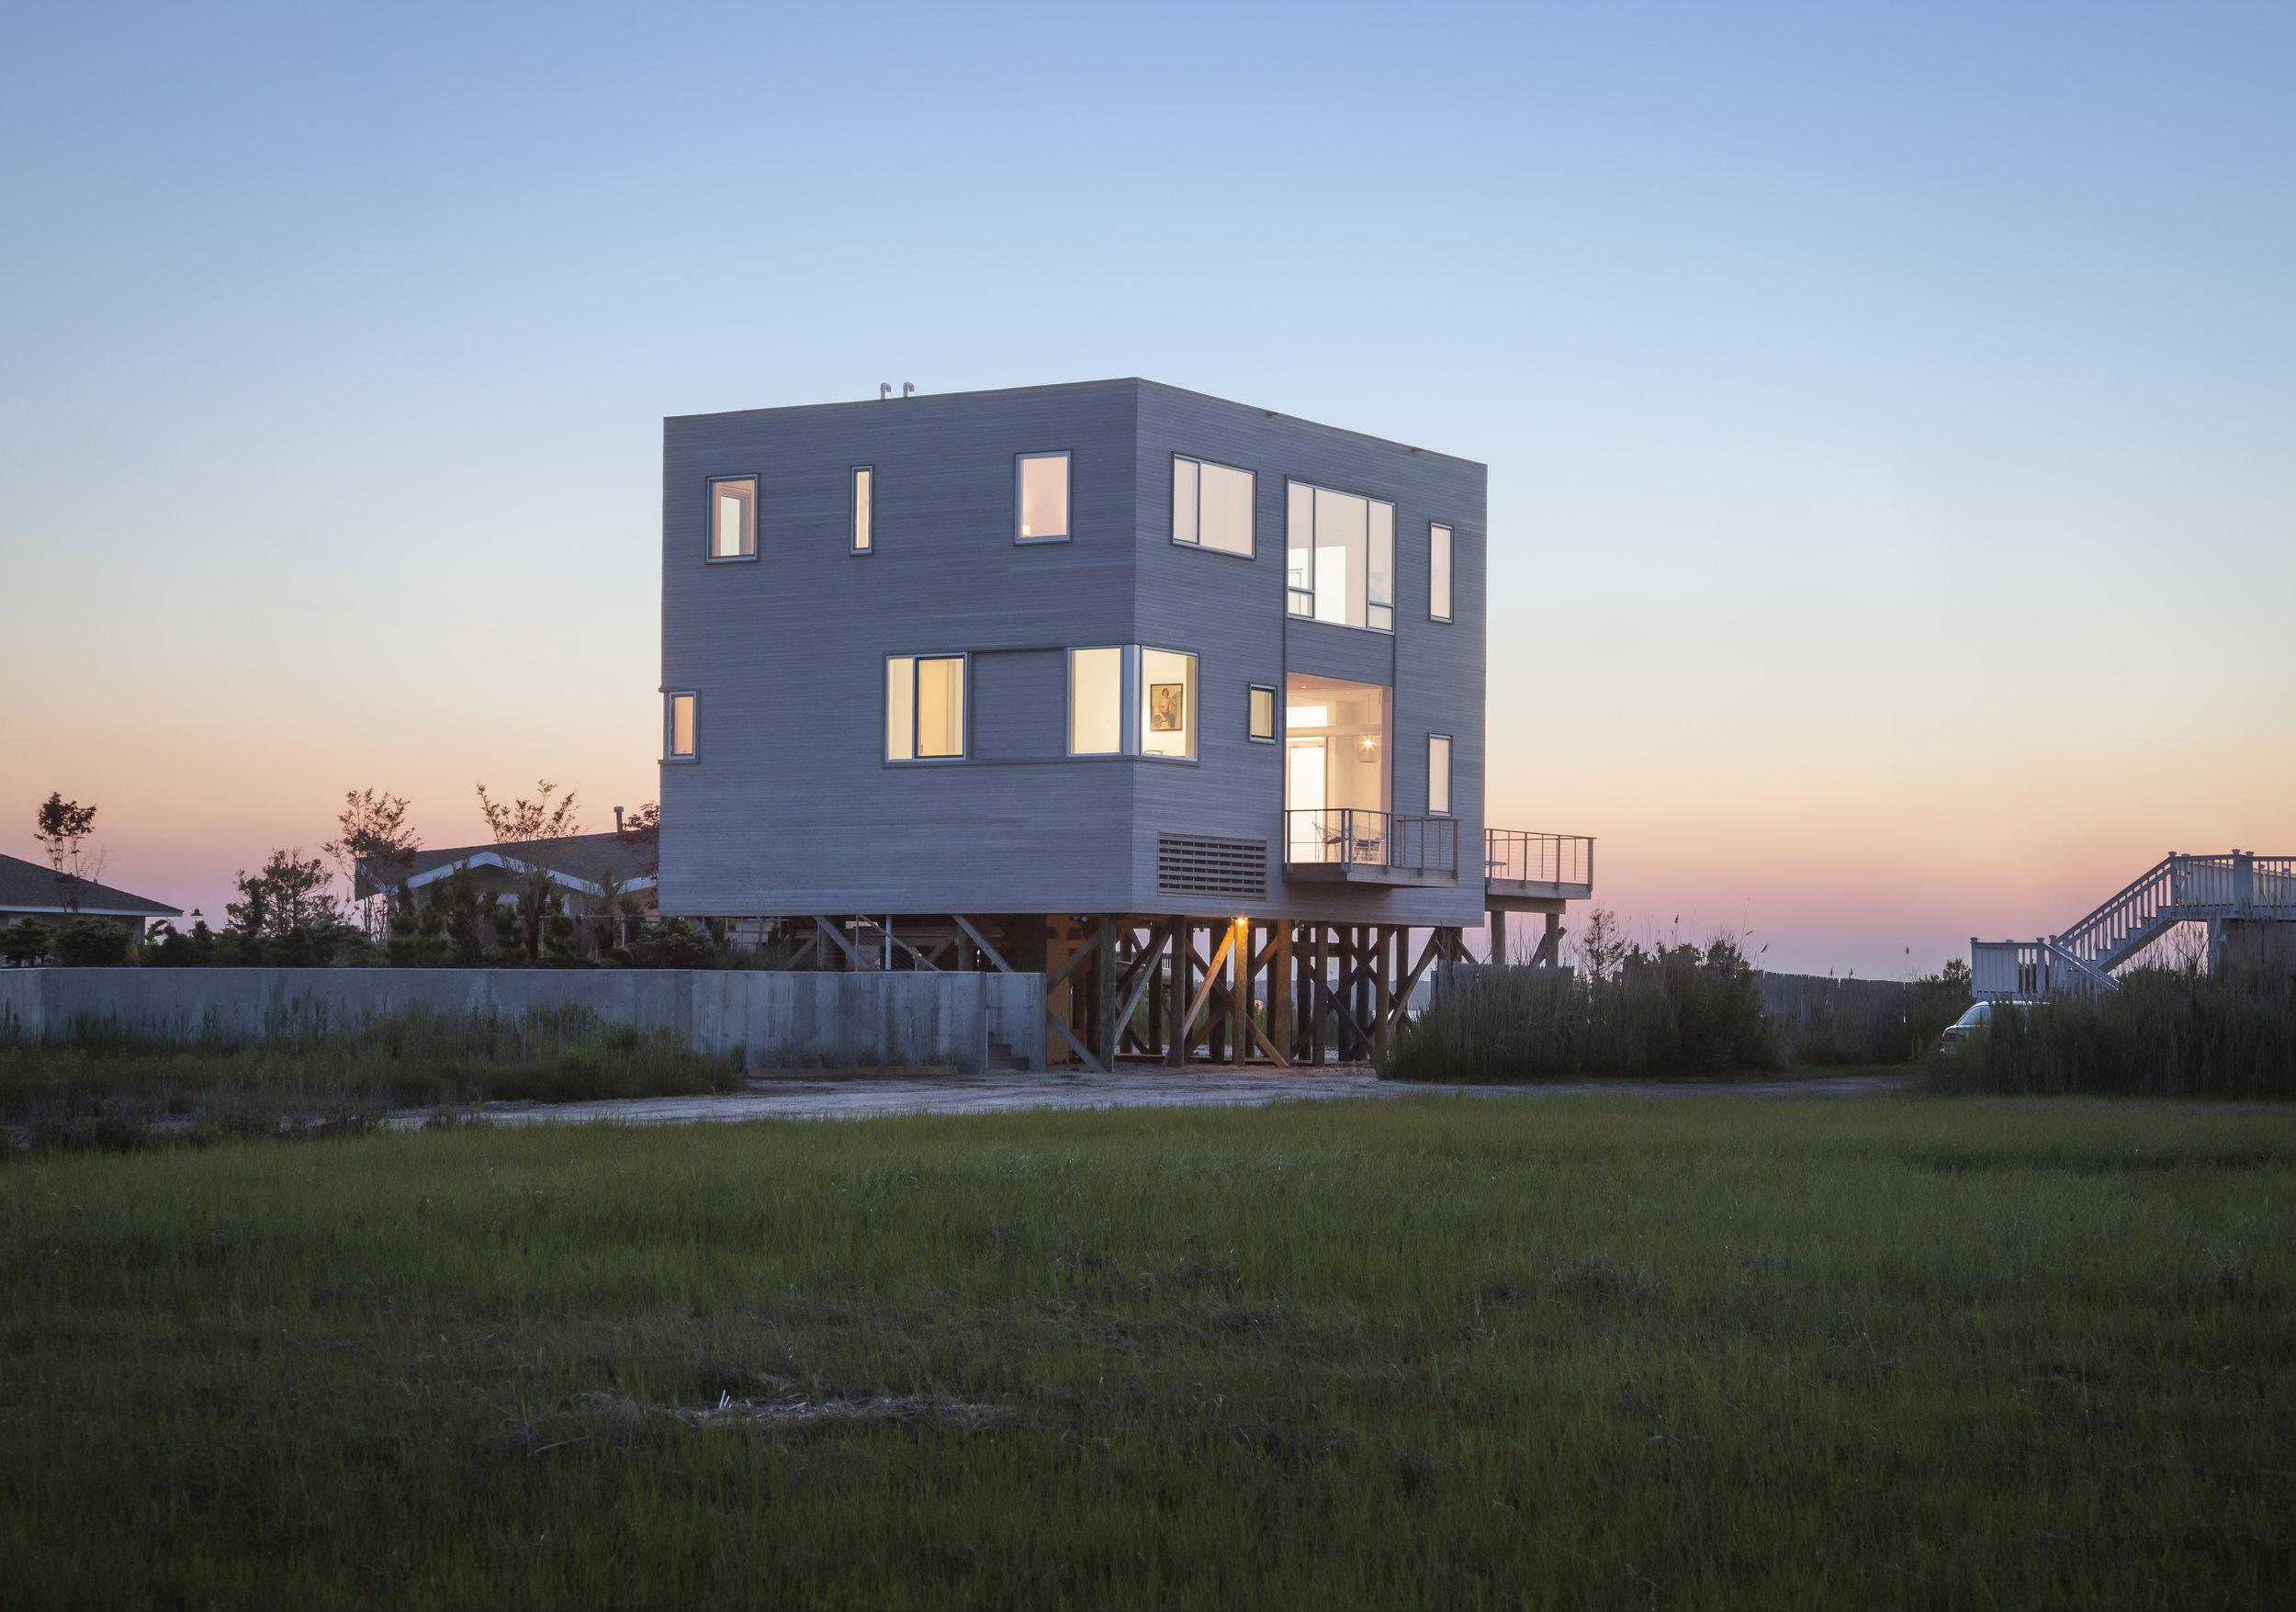 Cube House, West Hampton NY, Leroy Street Studio Architecture. © Christopher Payne/Esto